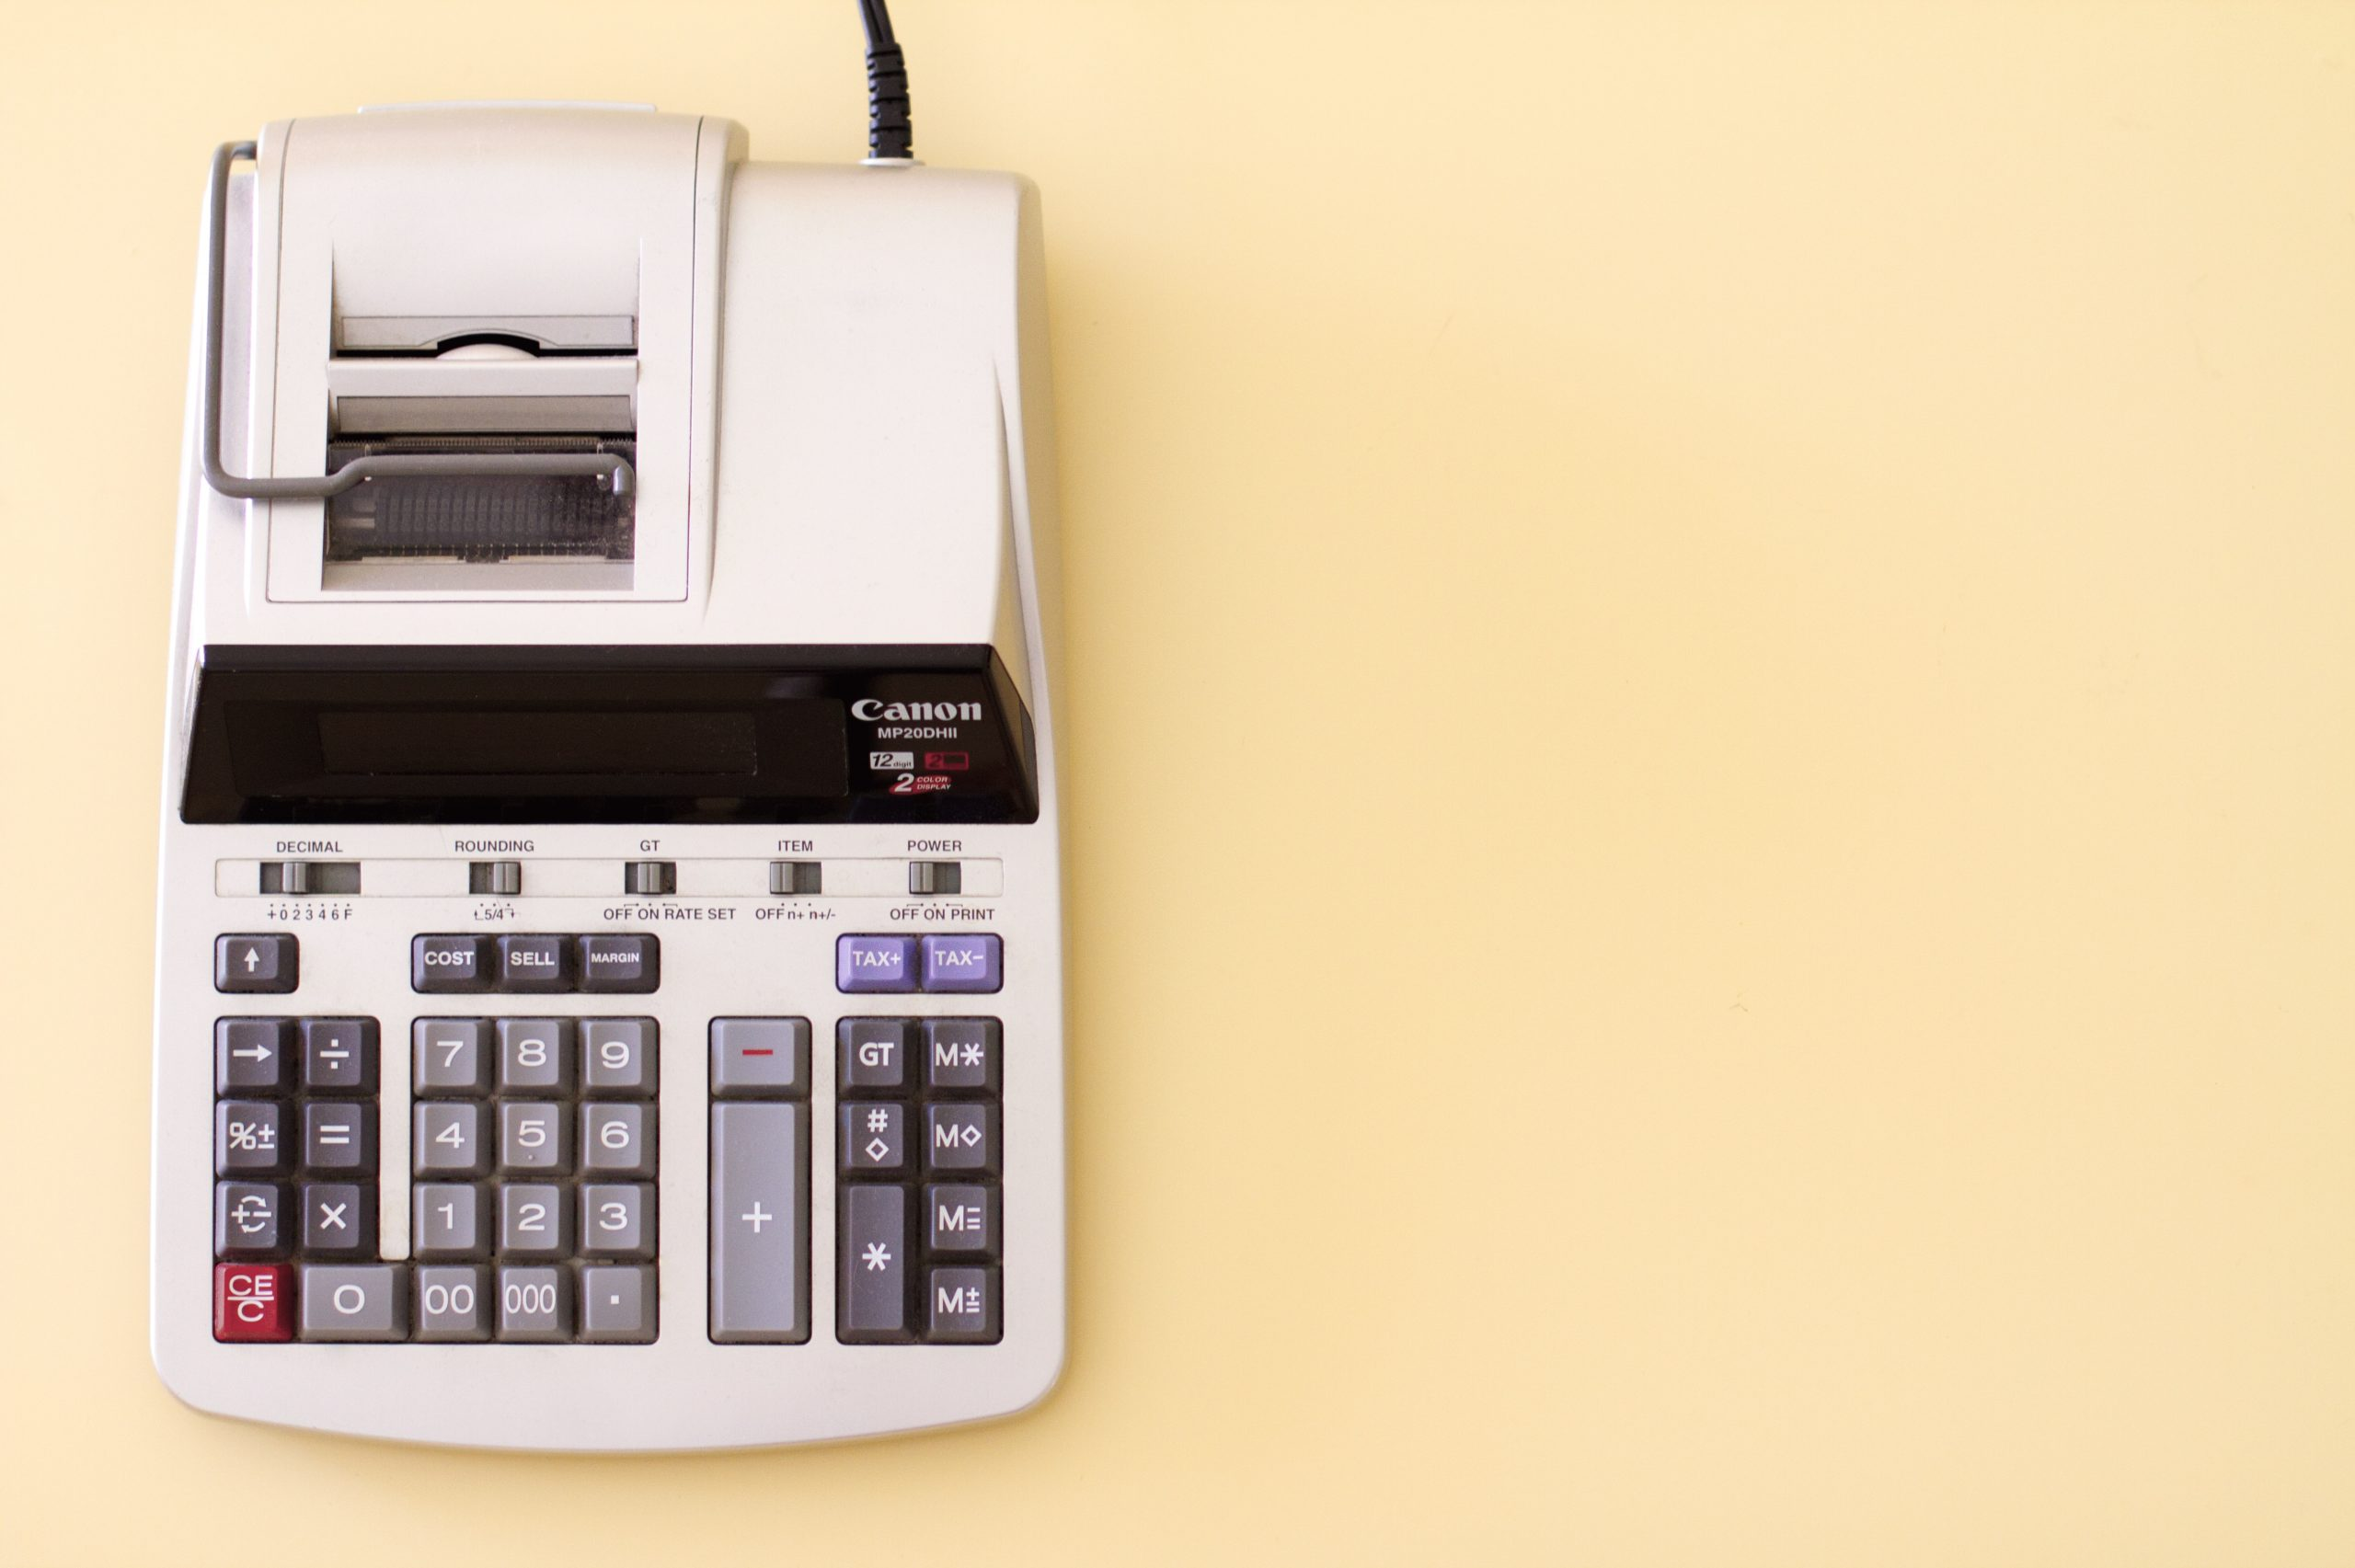 APRC calculator